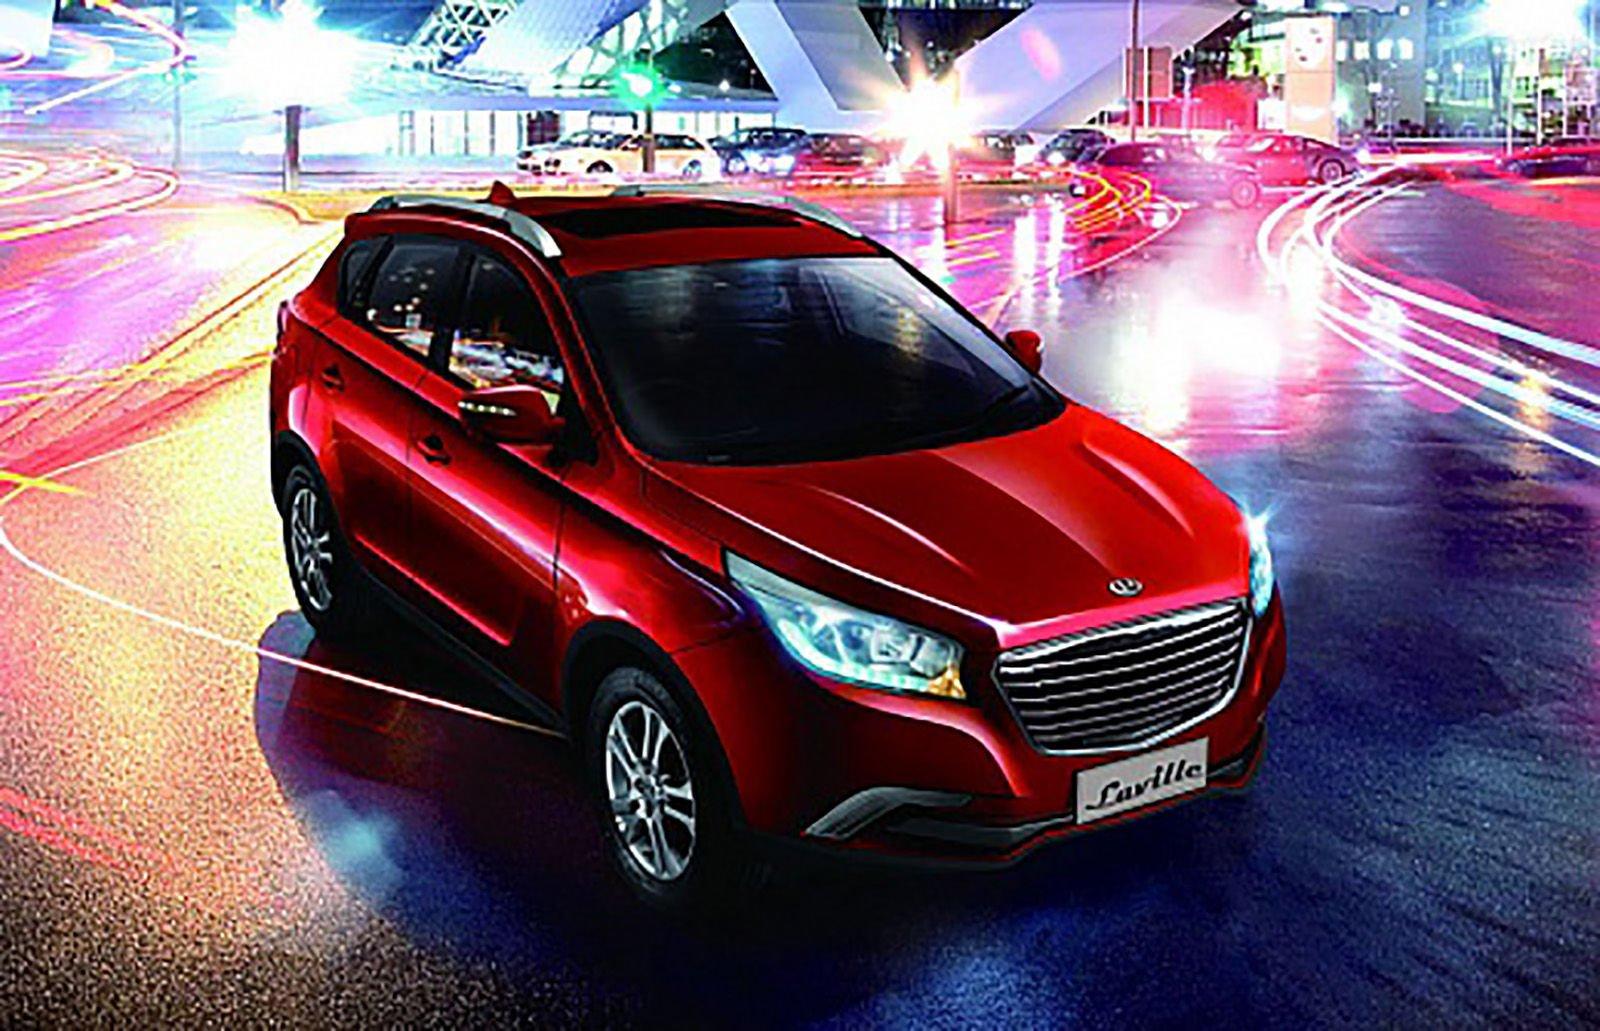 Китайский паркетник Hawtai Laville будет продаваться в РФ